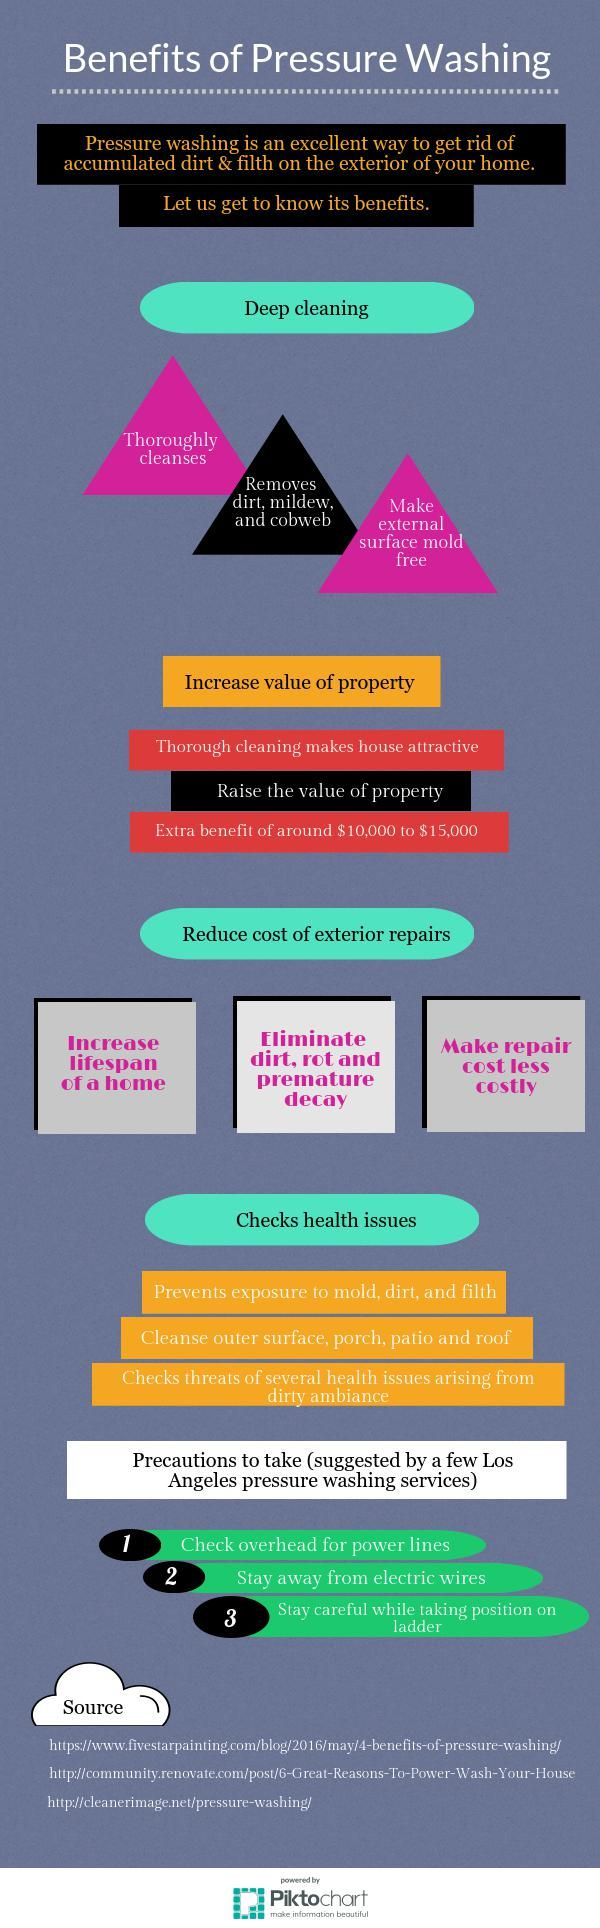 Benefits of Pressure Washing  https://magic.piktochart.com/output/22215383-benefits-of-pressure-washing